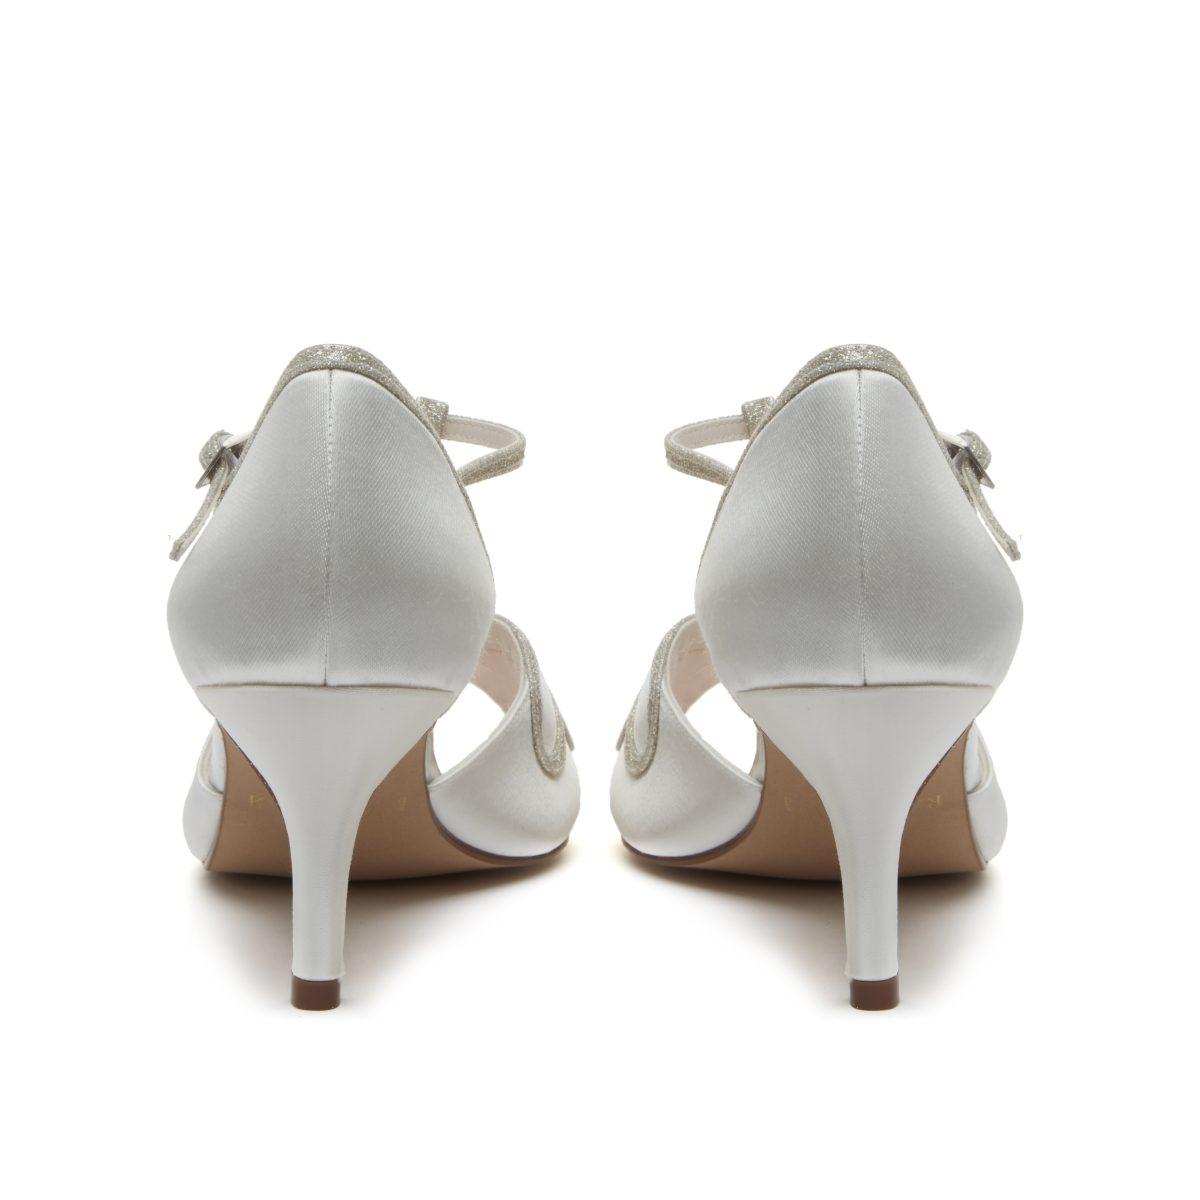 Rainbow Club Harlow - Peep Toe Satin/ Silver Shimmer Shoe 4